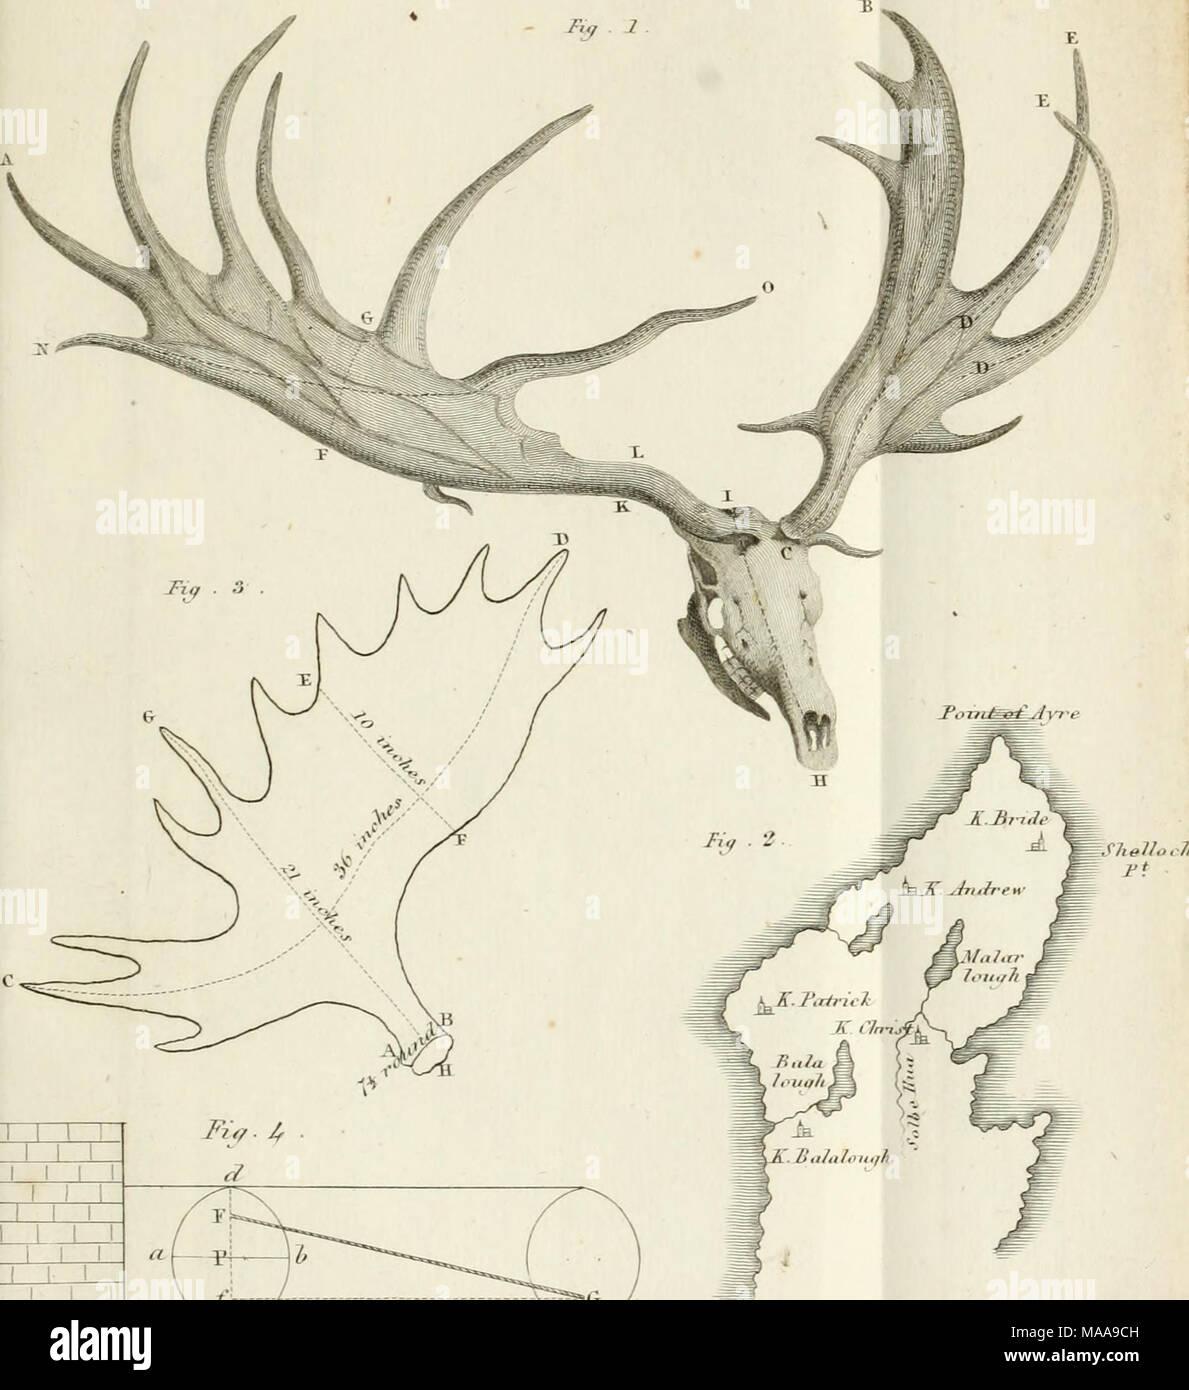 ". The Edinburgh journal of science. v. 1-10, July 1824-Apr. 1829; new ser., v. 1-6, July 1829-Apr. 1832 . 1 1 1 1 1 1 1 1 1 1 1 1 1 I 1 1 â¢( , ^L / y 1 1 1 1 1 1 1 1 1 1 1 1- 1 1 1 1 1 ^^^^v**""**** 11 1 ^â .y X 1 1 1 1 1 1 1 ( 1 1 ! 1 27te^nci^7it Zaiej- now ..hUtei-.rte.I of //..â Ij^le ot'MiTii <j.r t/i,'v .rul.<n.e/,',/ inihe f^.n- Jo Jo. -PuA/ij-Ai-J Iv W.B/âc'An-o0j jSeJ. â¢nui^i jâ,^i Stock Photo"